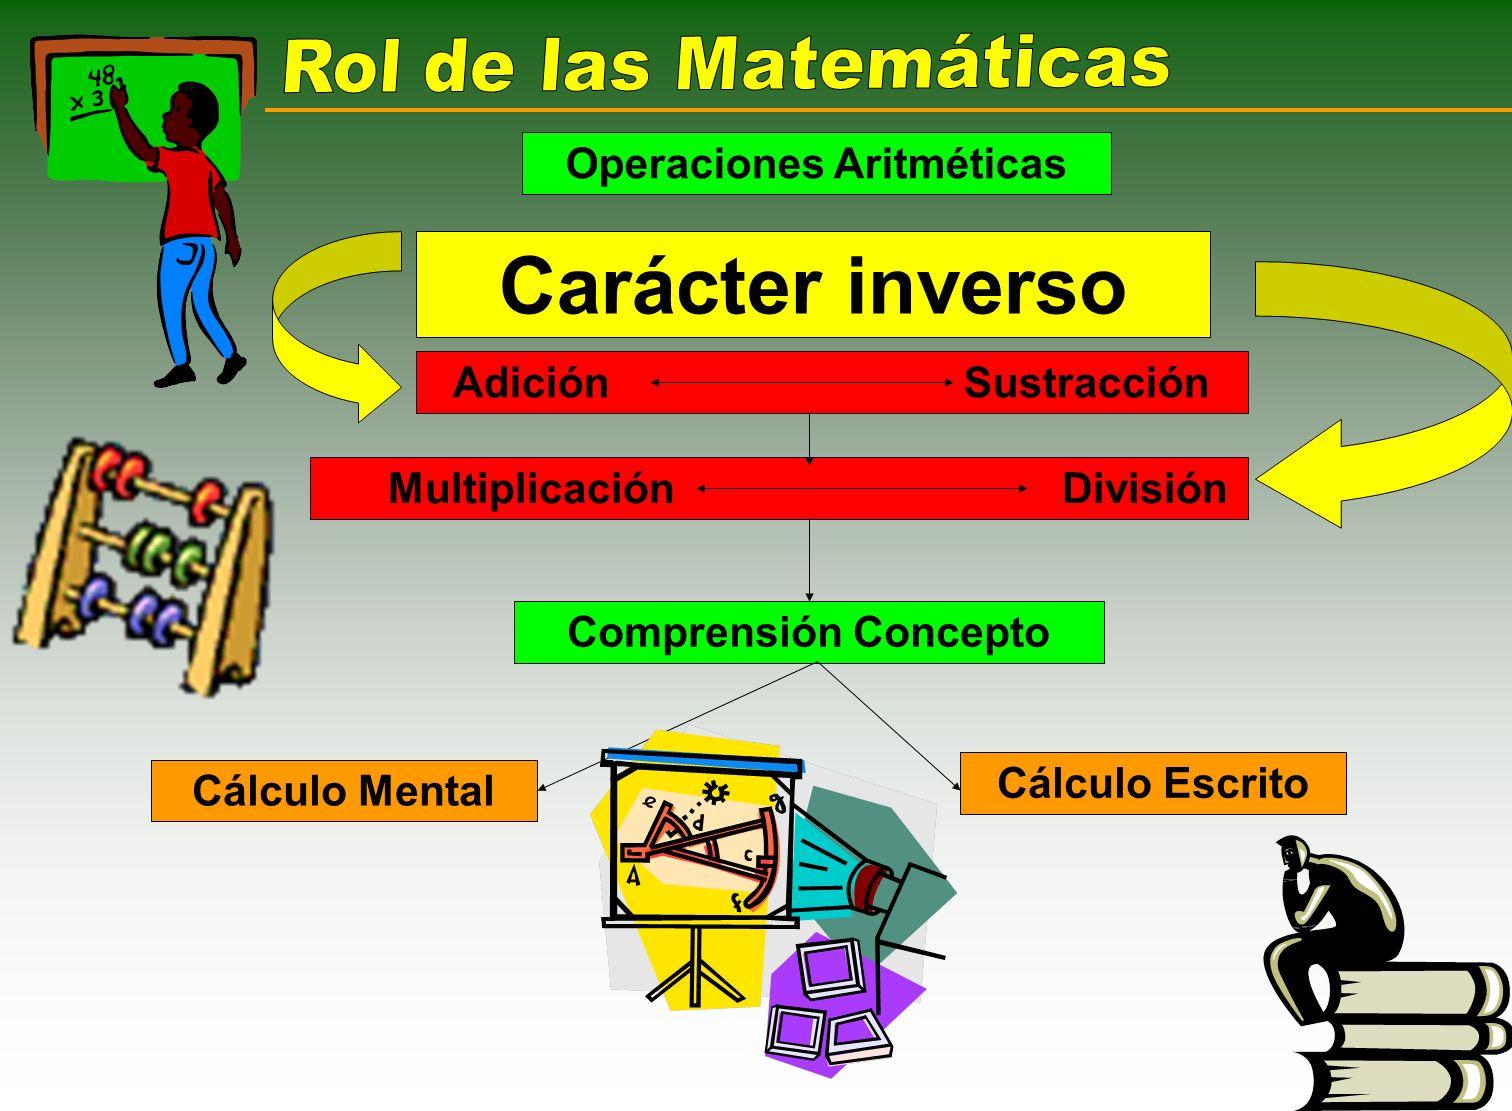 Operaciones Aritméticas Carácter inverso Adición Sustracción Multiplicación División Comprensión Concepto Cálculo Mental Cálculo Escrito